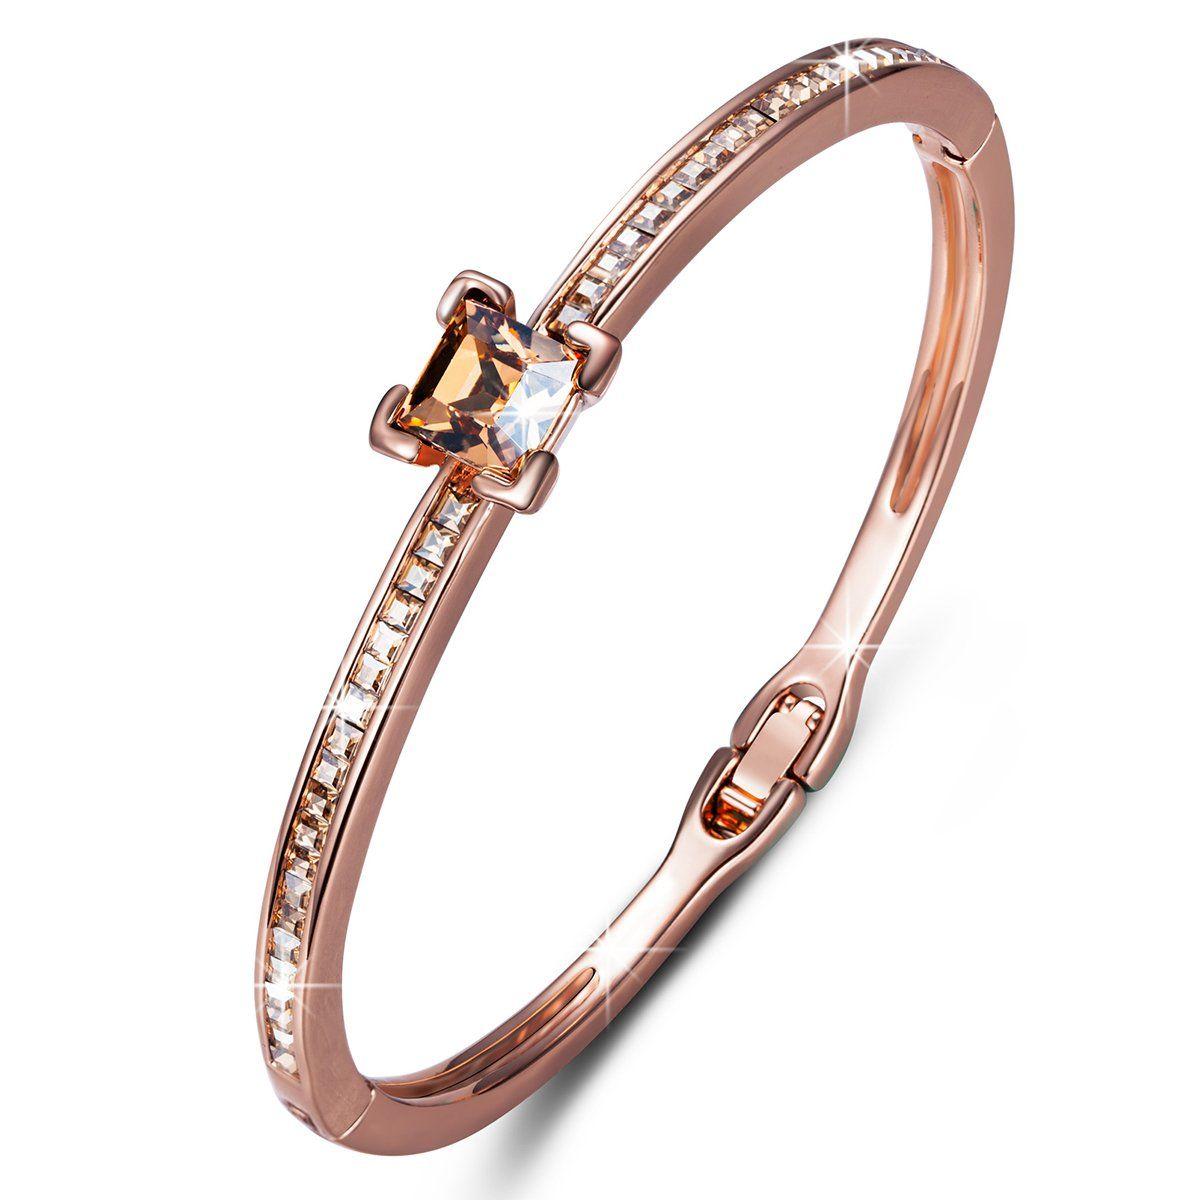 Qianse elegant rose gold plated bangle bracelets with austrian